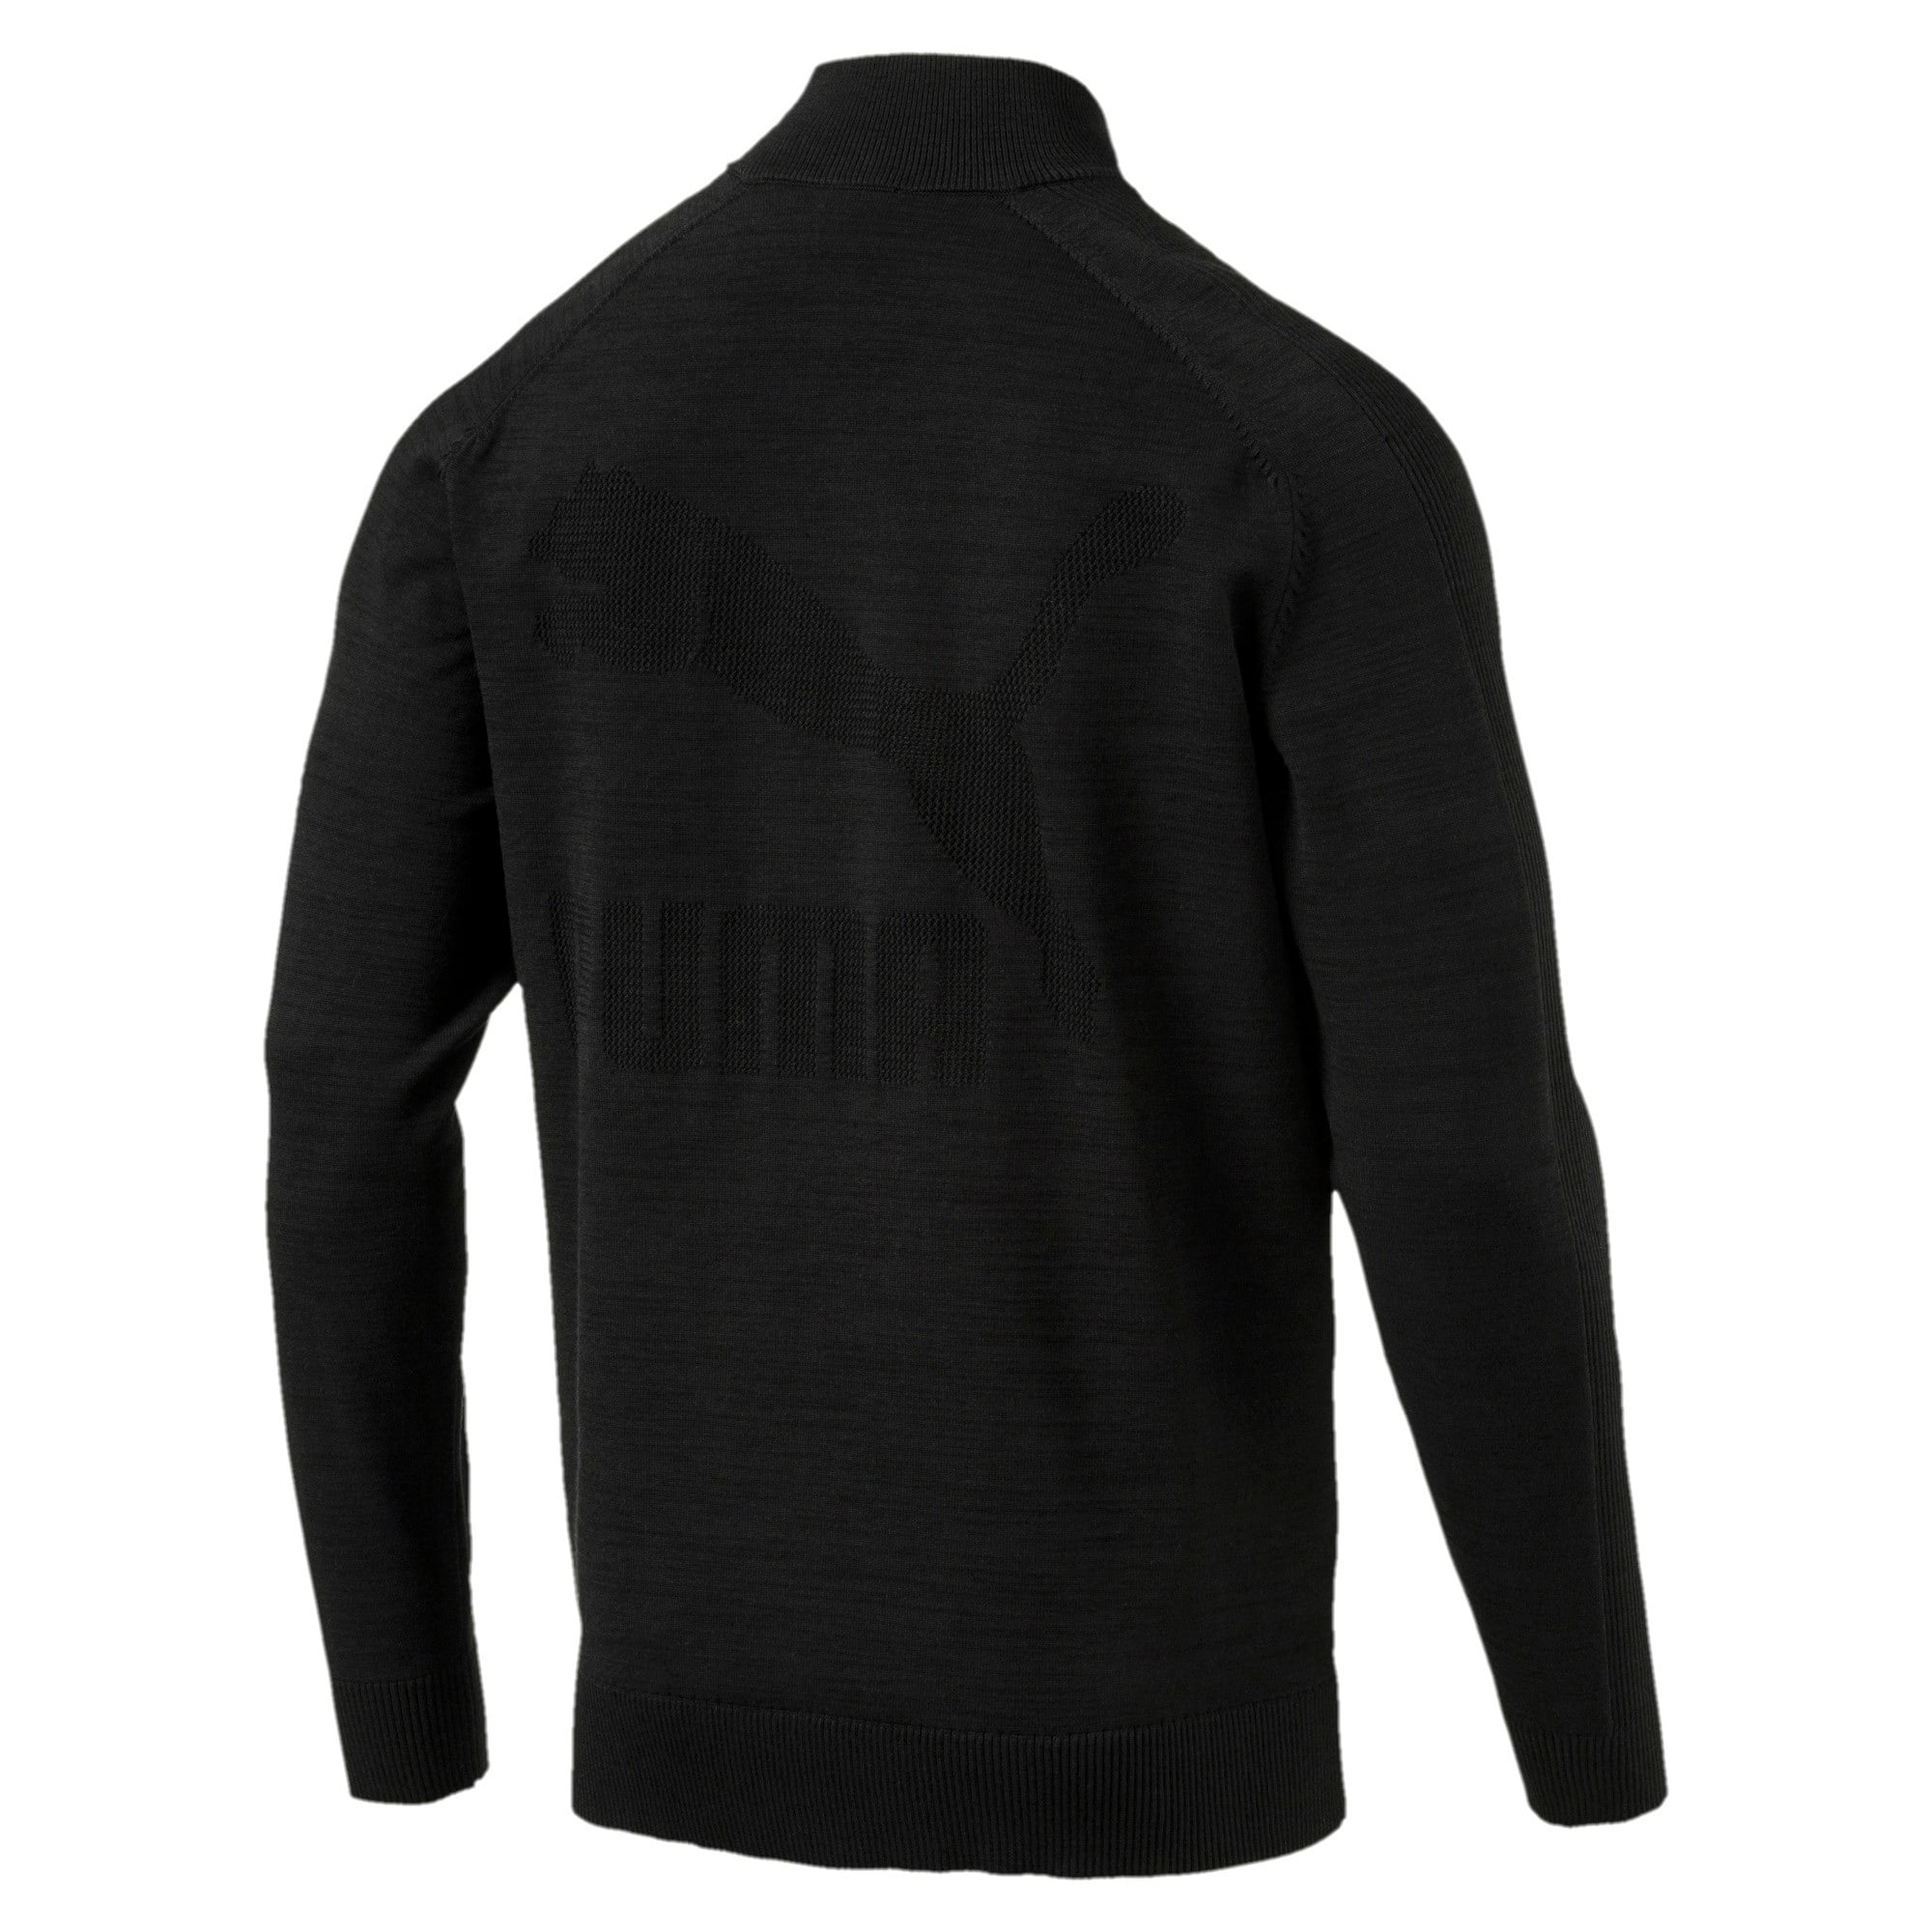 Thumbnail 3 of Men's T7 evoKnit Jacket, Puma Black, medium-IND